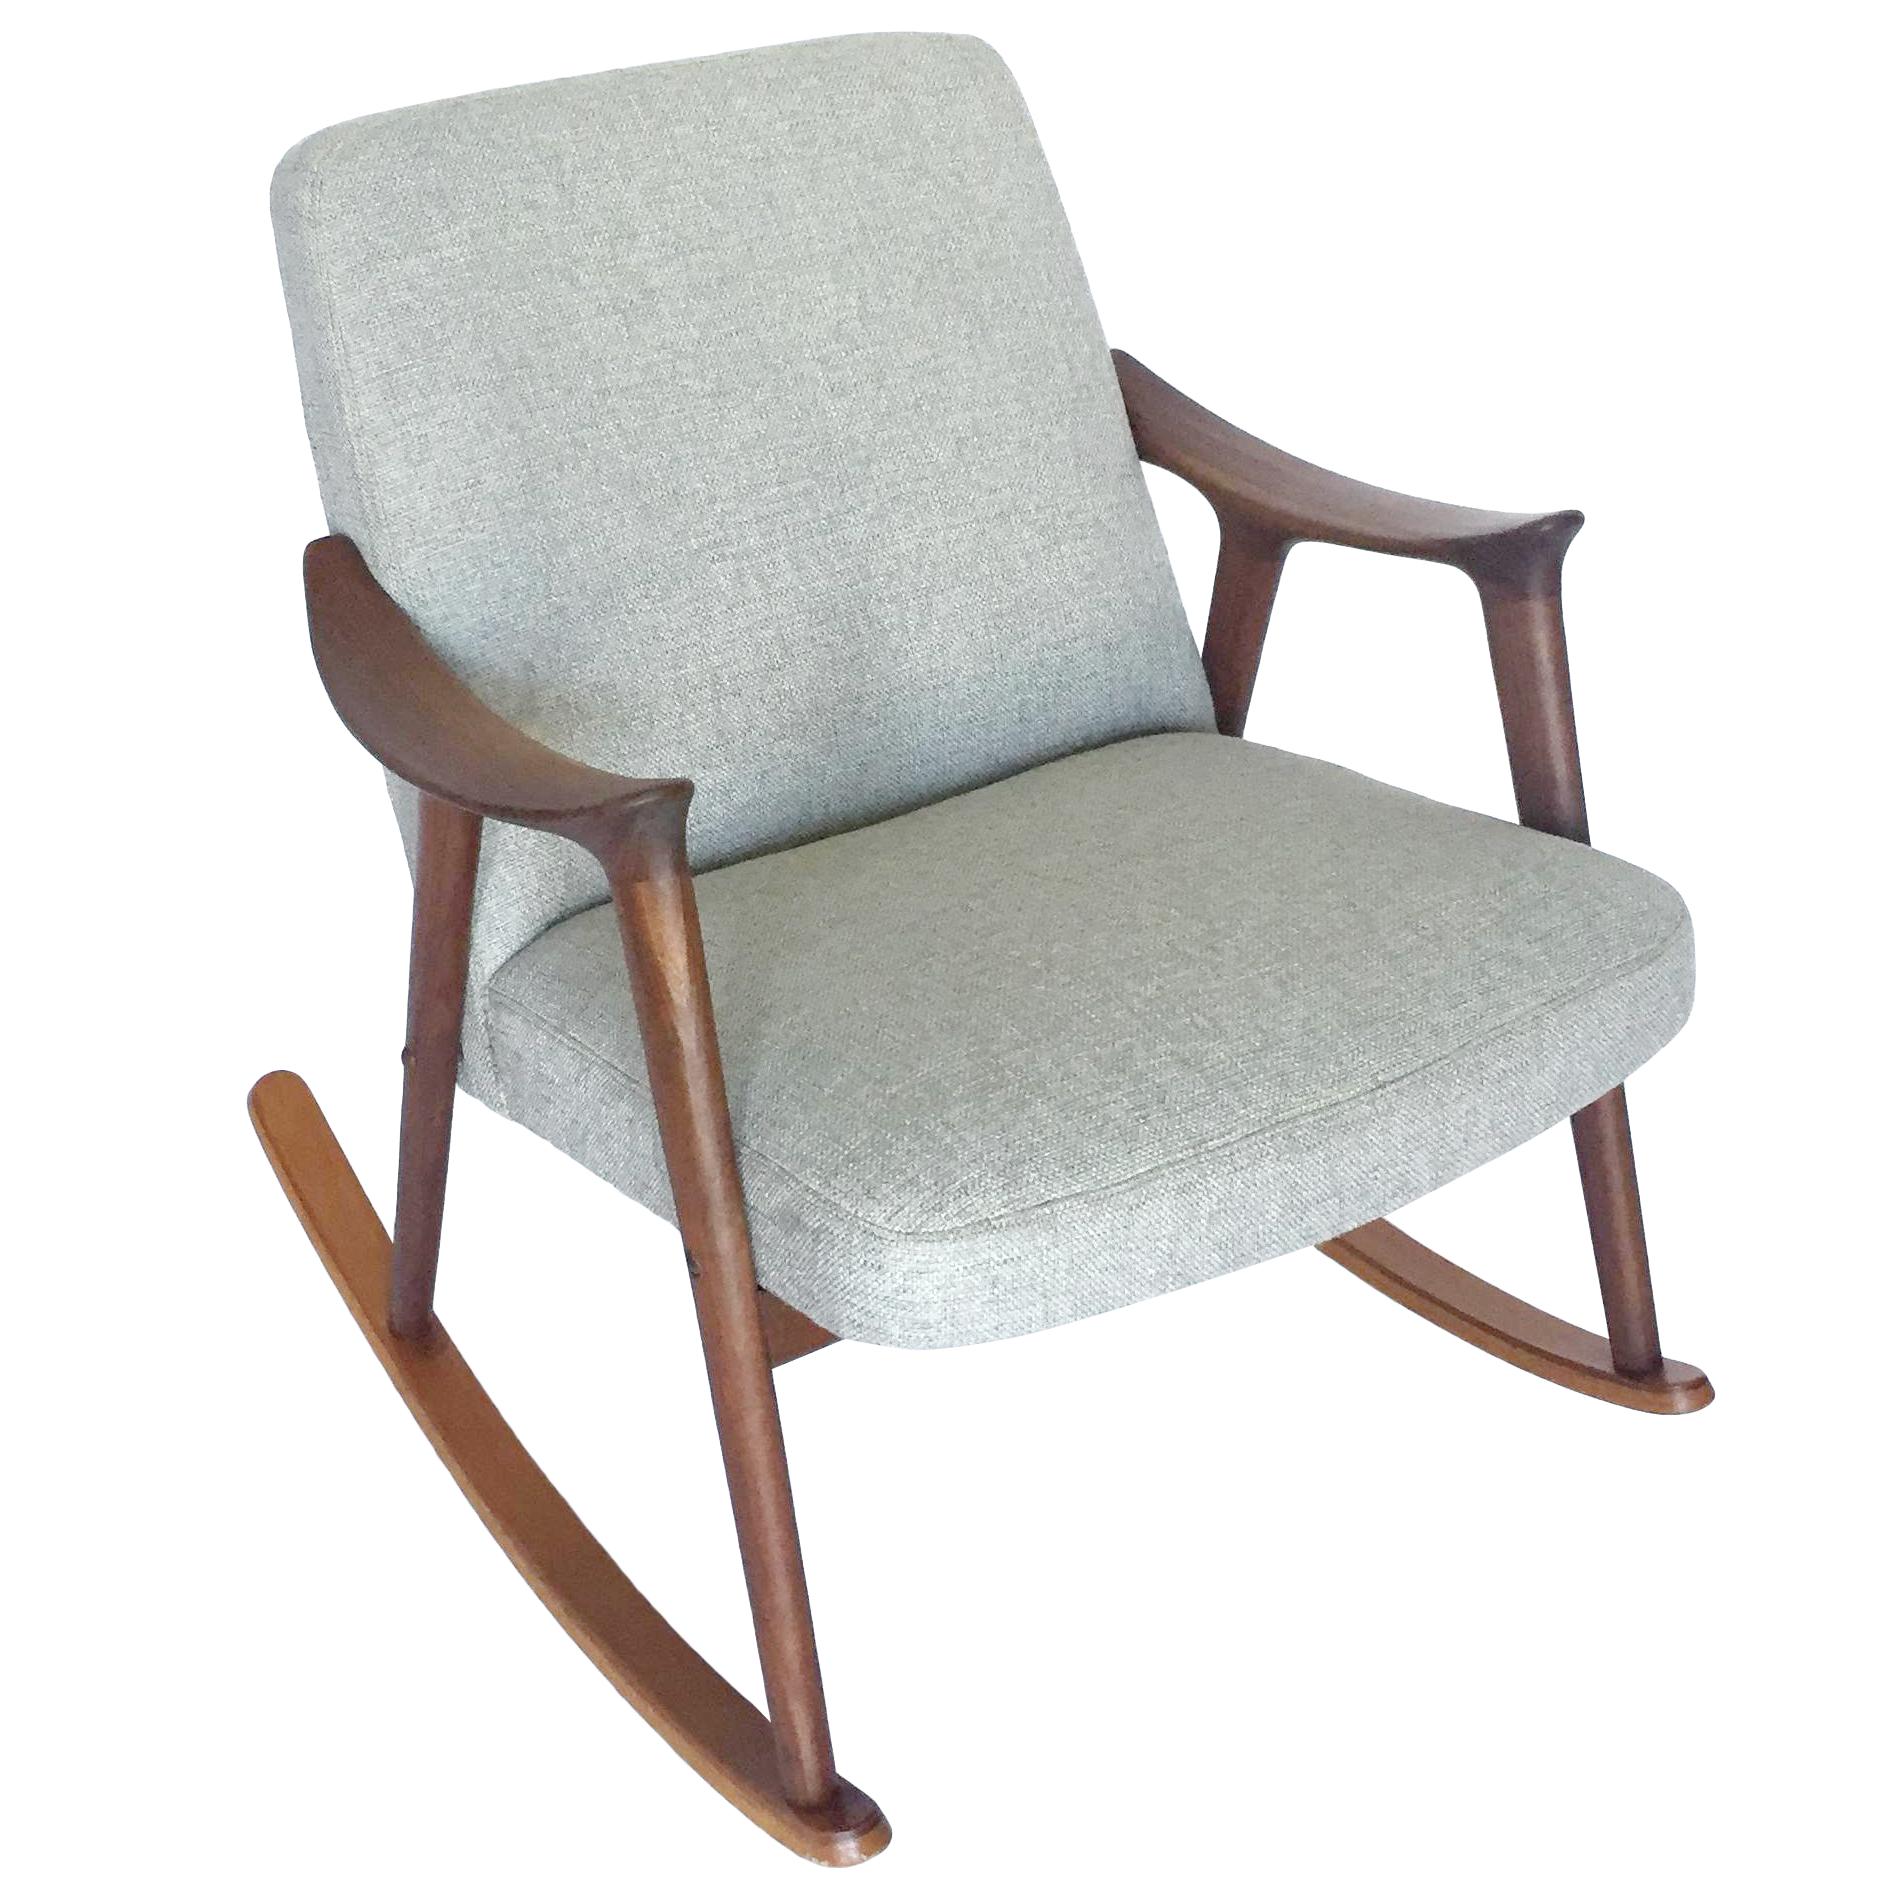 century asp chair rocking mid p